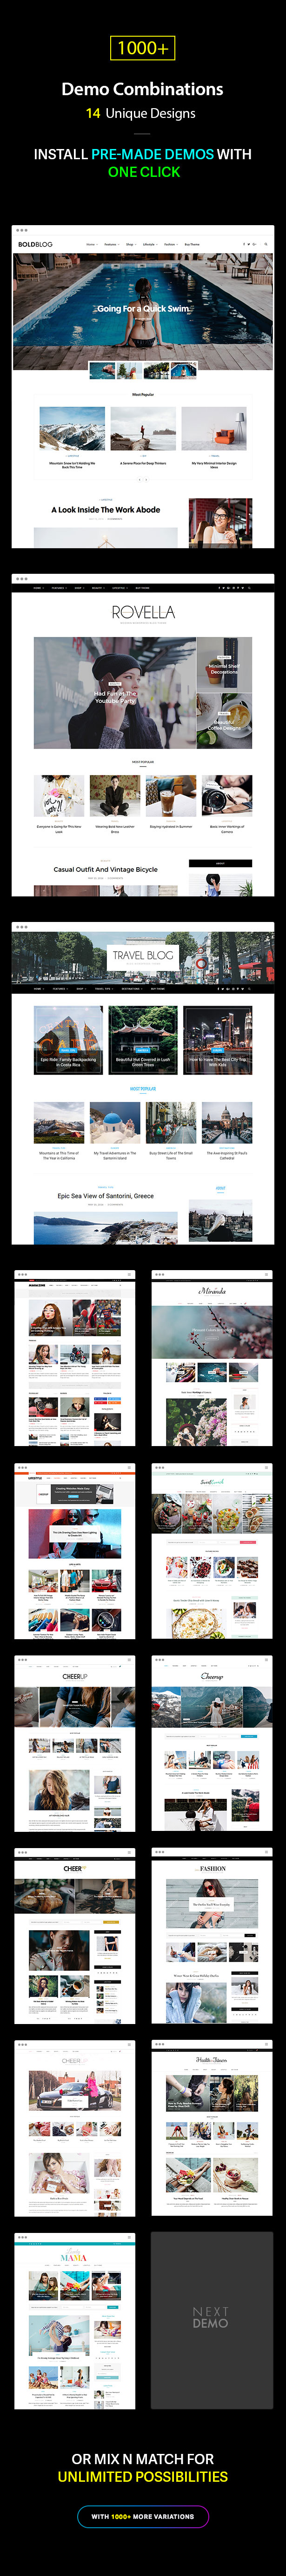 Multiple Blog and Magazine Layouts, 14+ Unique Designs